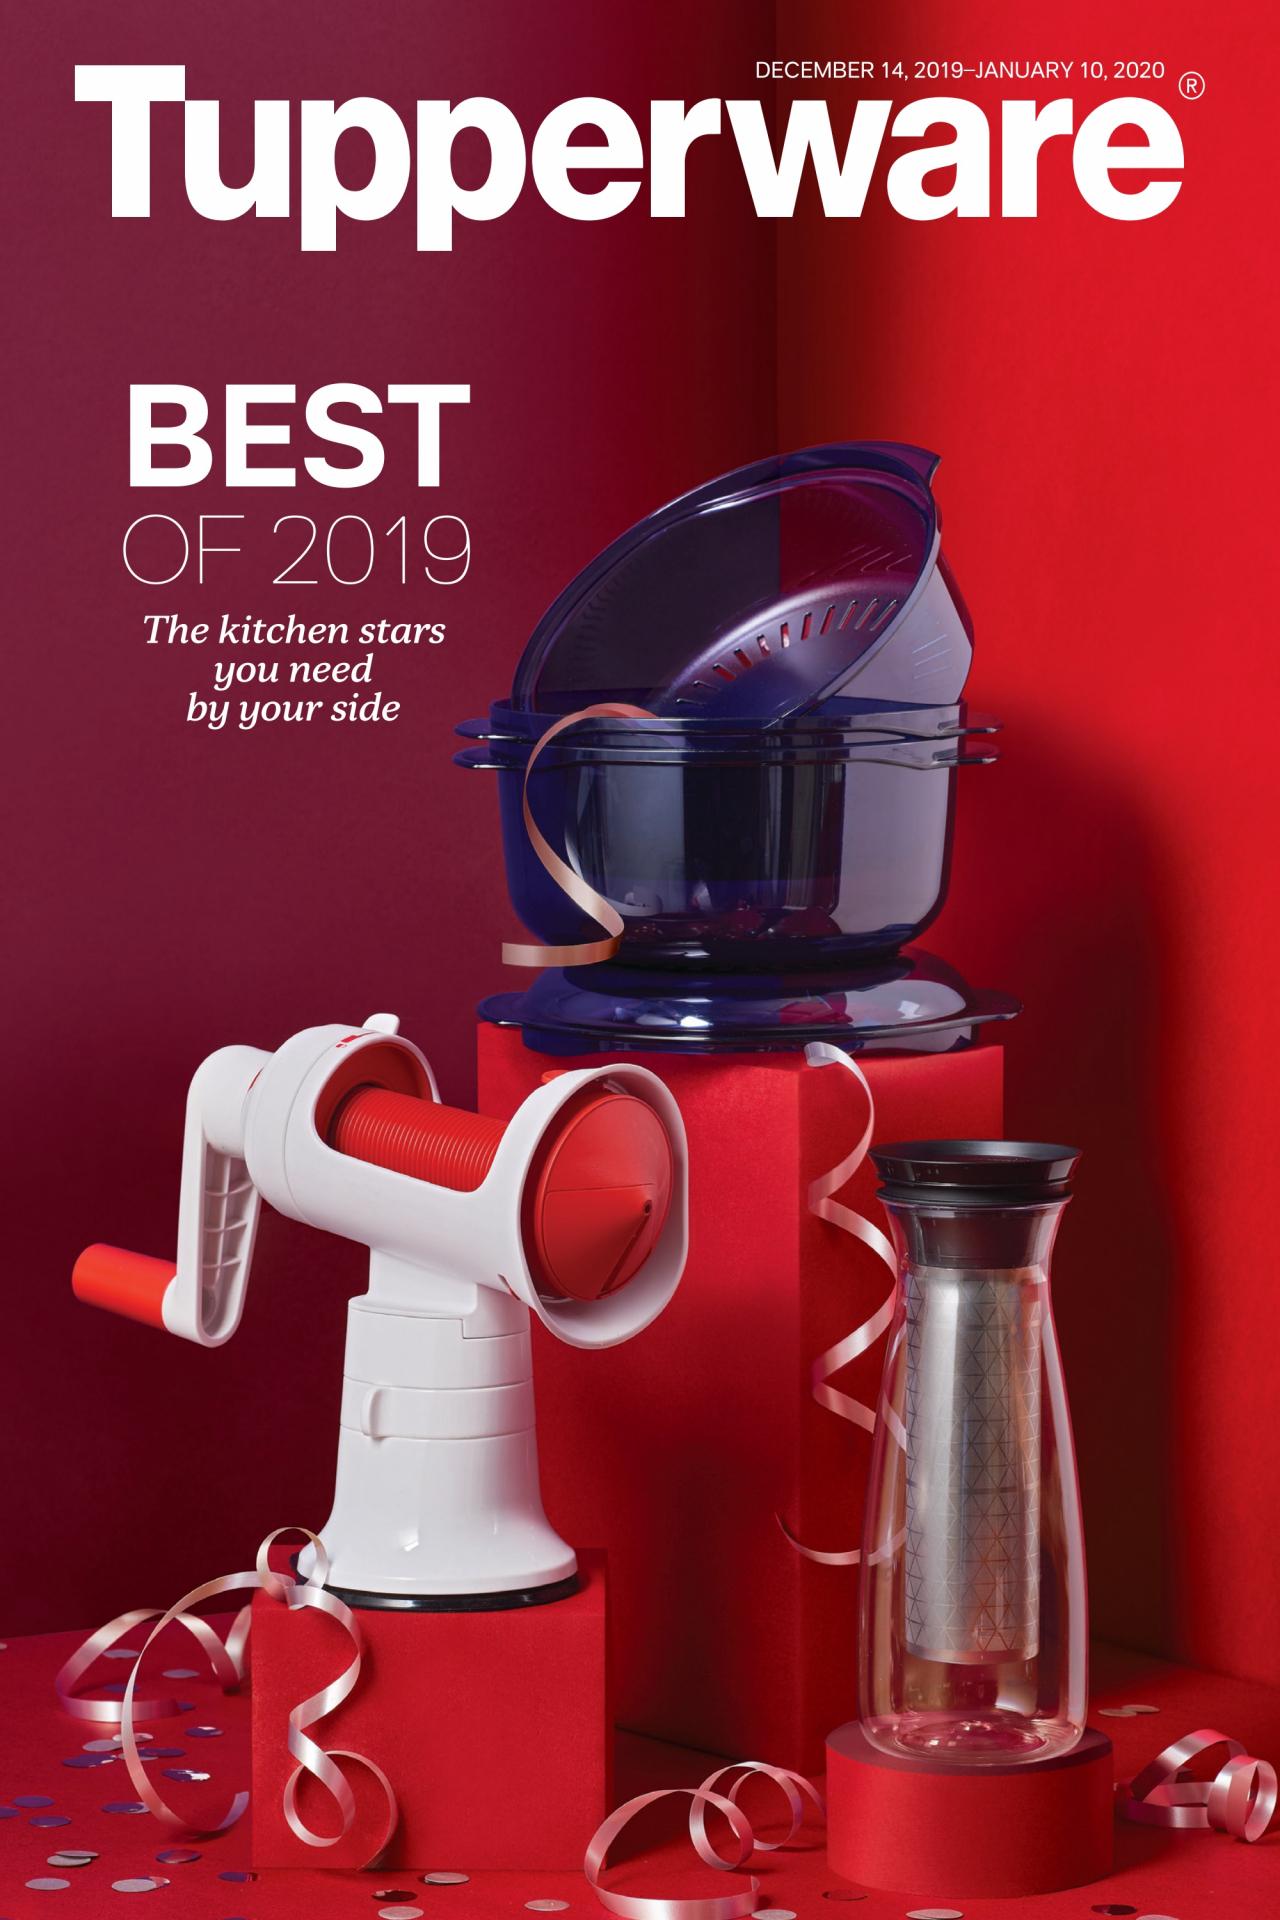 Tupperware Brochure – Valid Dec 14, 2019  Jan 10, 2020 throughout Tupperware Catalogue 2020